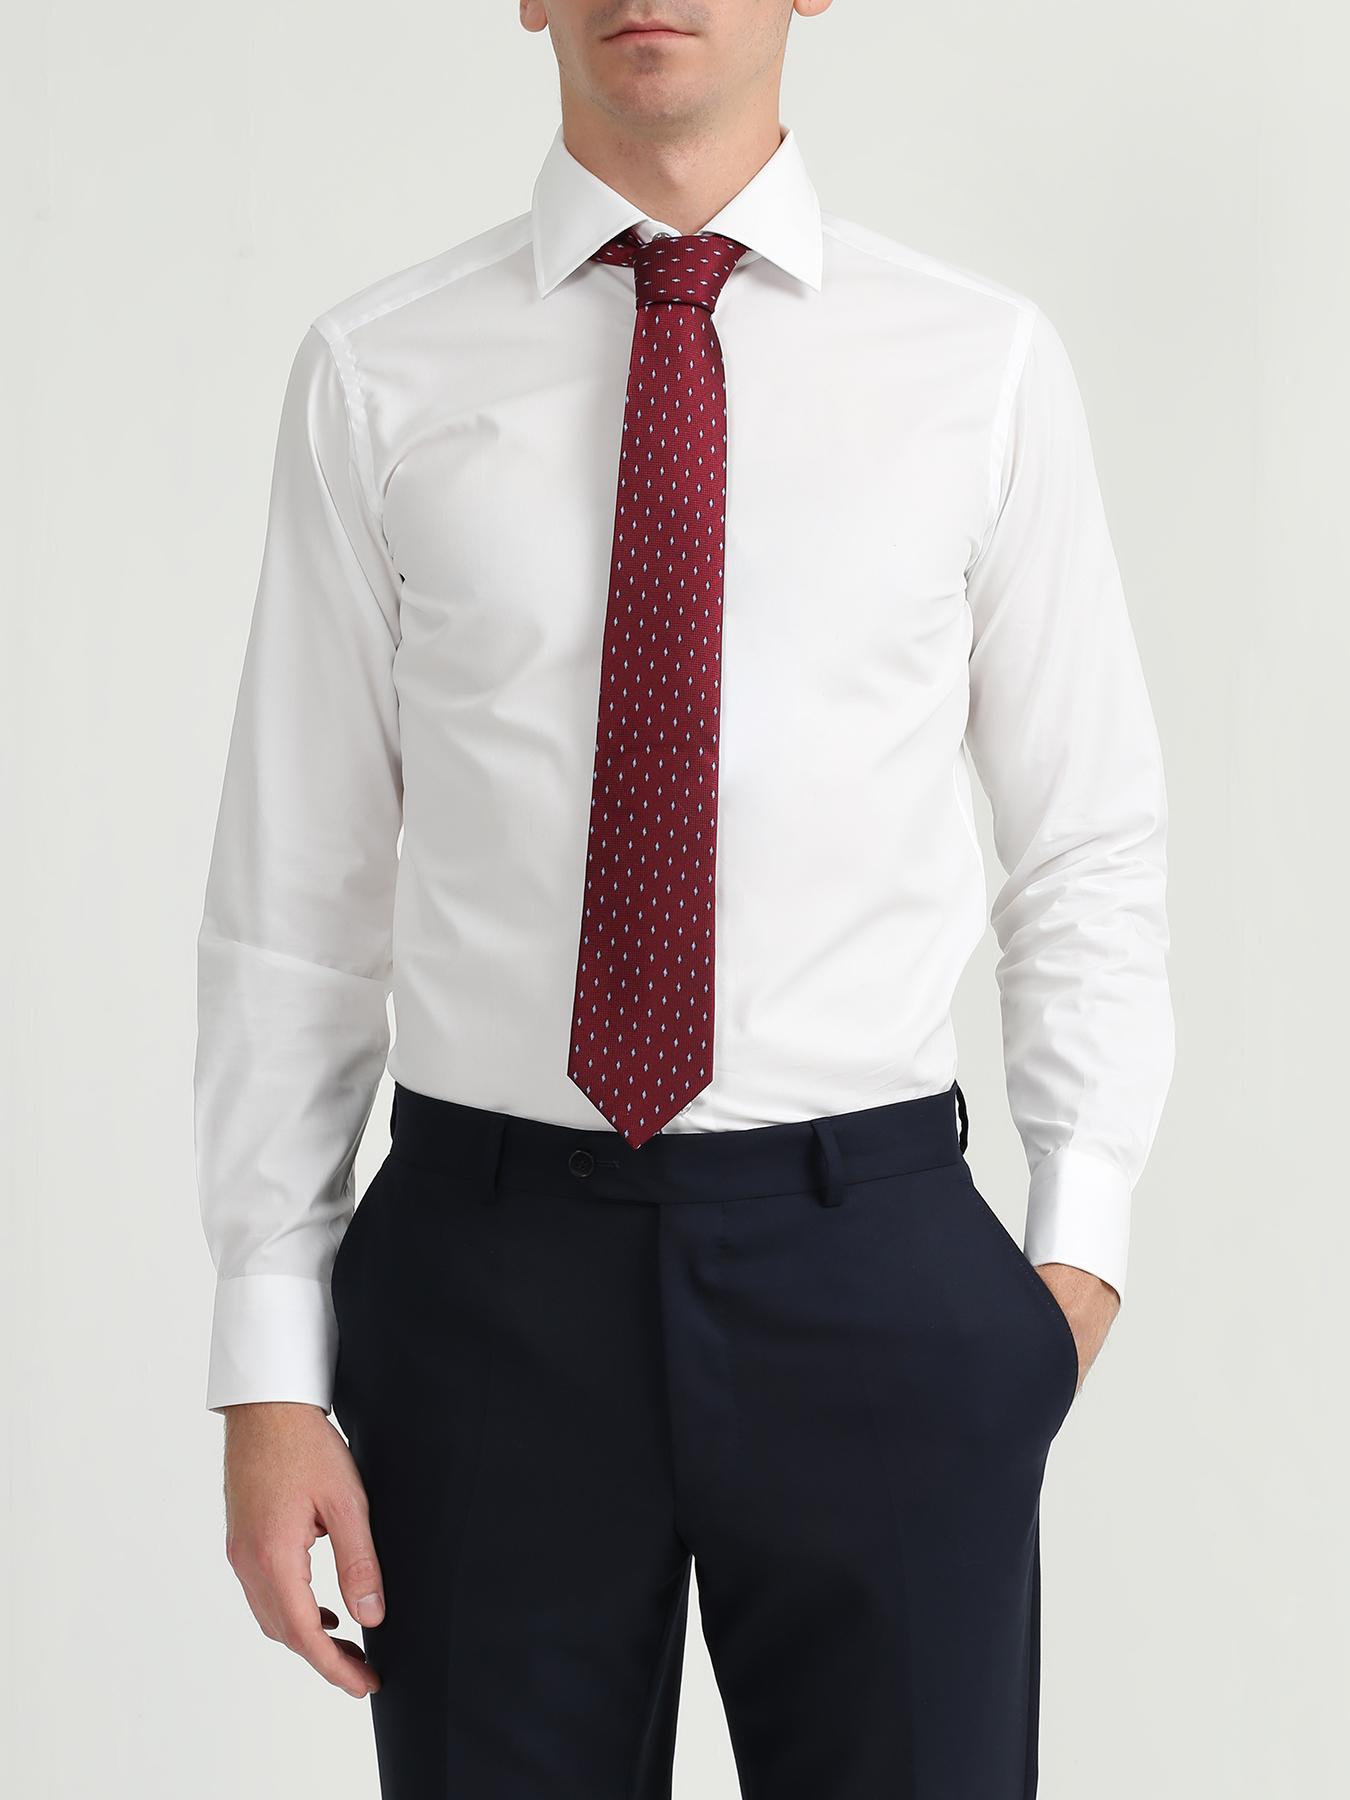 Alessandro Manzoni Шелковый галстук с узорами 324187-185